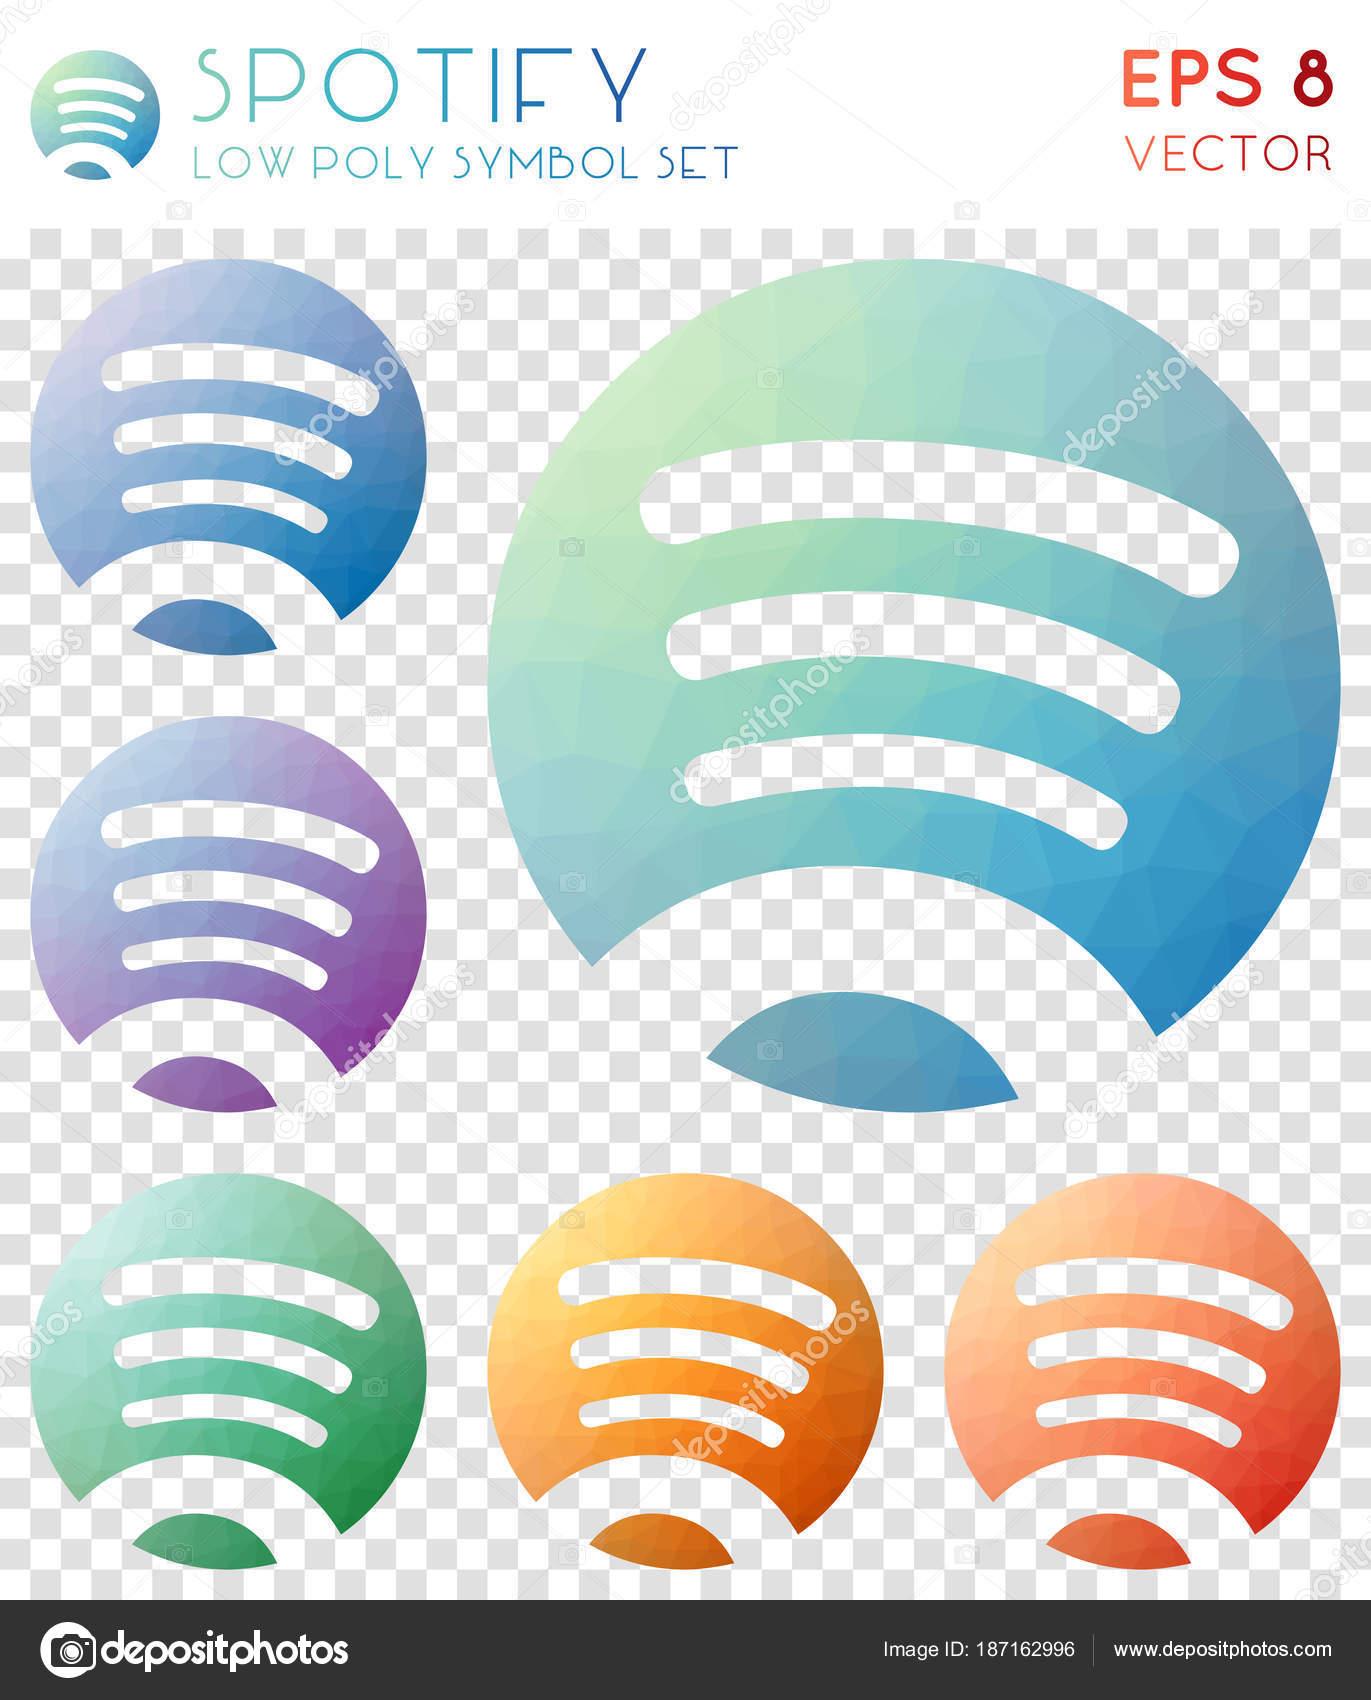 Spotify Geometric Polygonal Icons Bizarre Mosaic Style Symbol